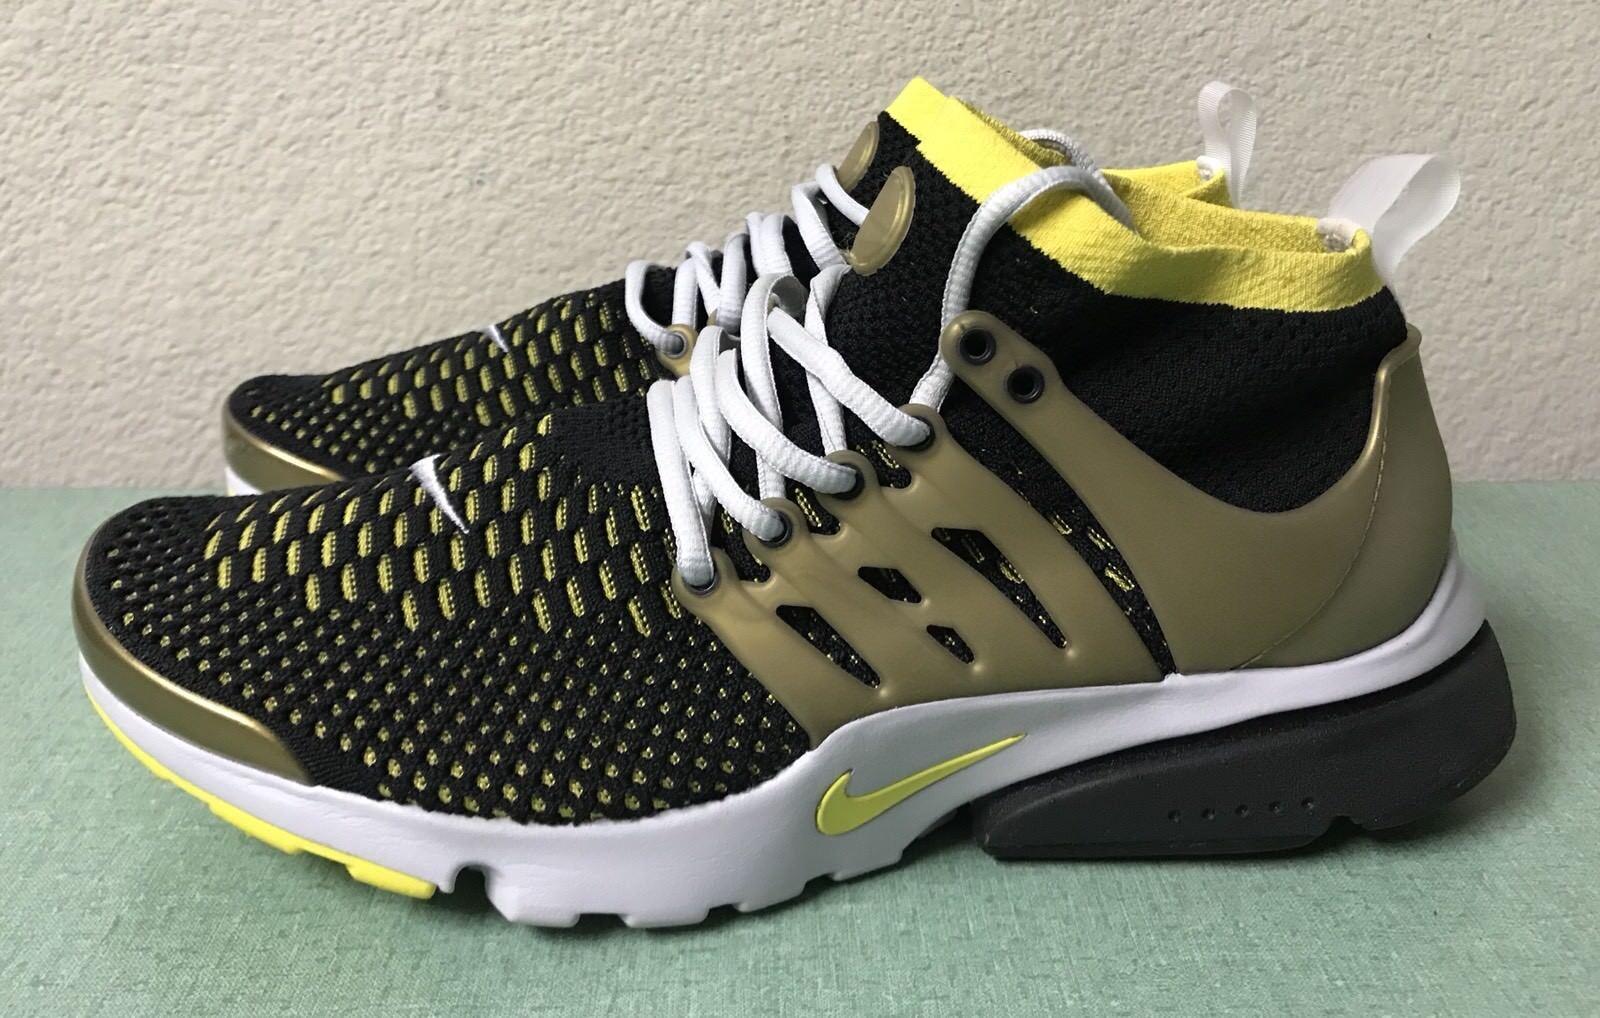 Nike Air Presto Ultra Flyknit Noir Jaune Gold blanc Hommes Sz 9.5 Running Chaussures